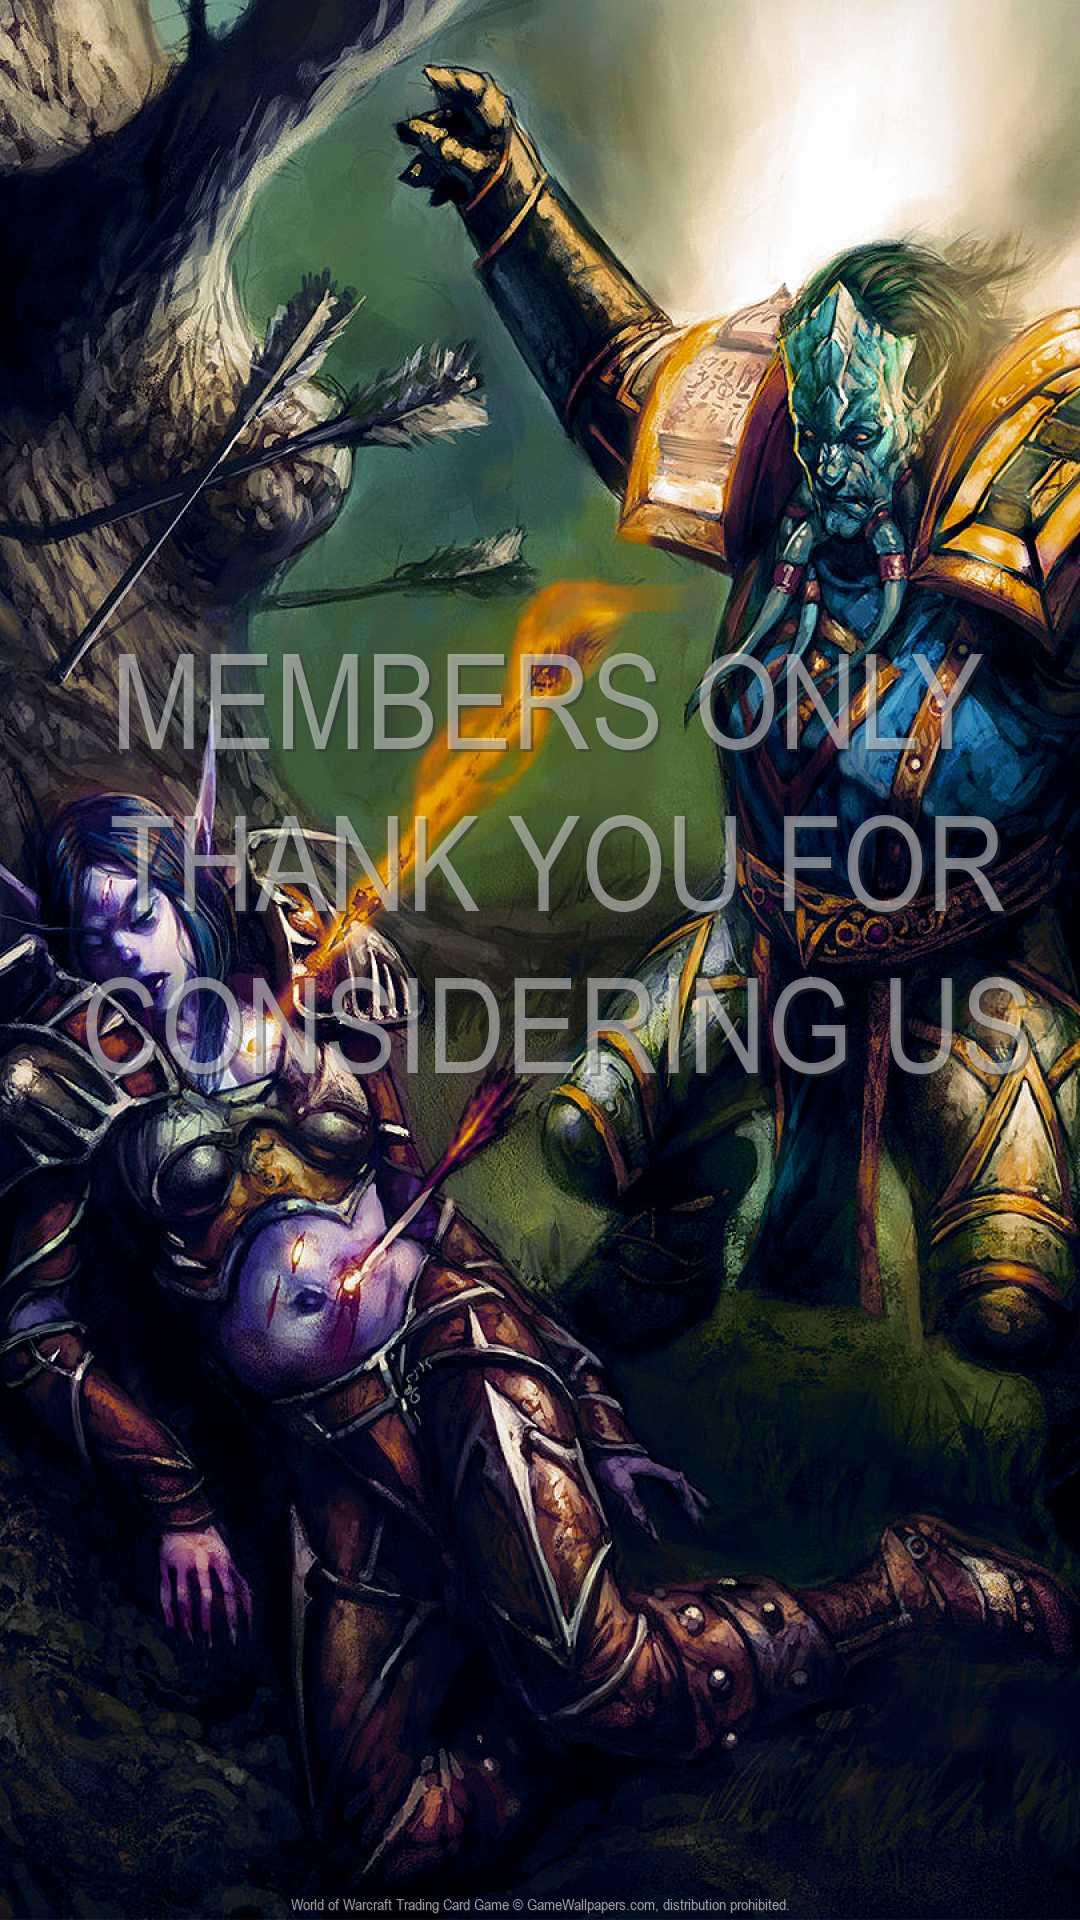 World of Warcraft: Trading Card Game 1080p Vertical Handy Hintergrundbild 38